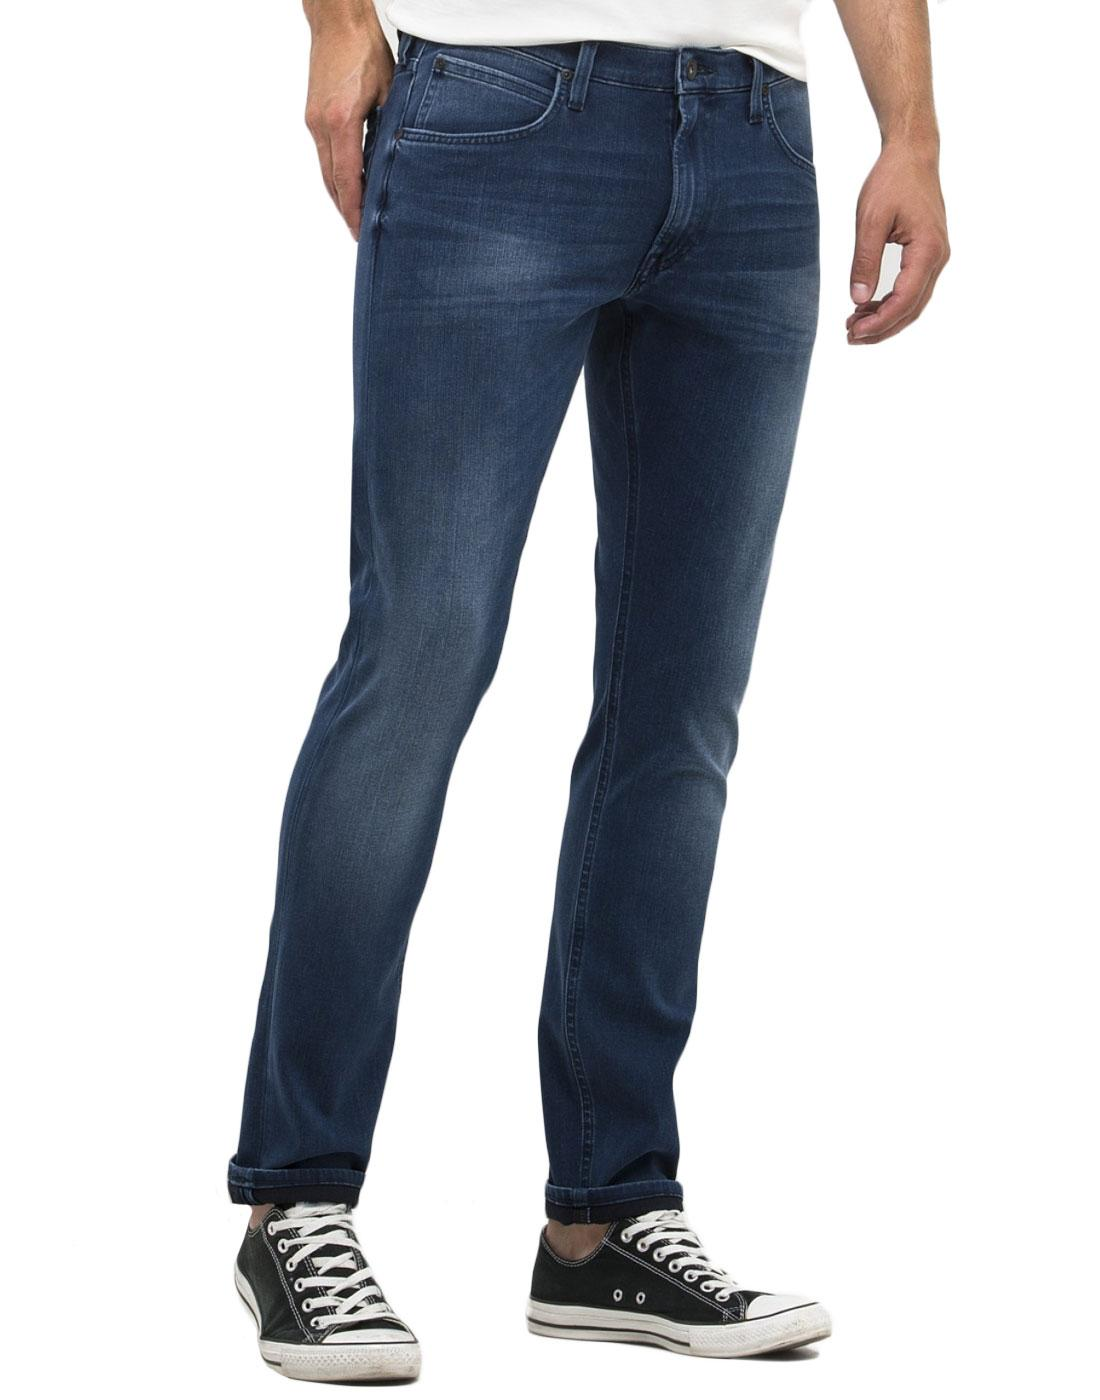 Luke LEE Retro Mod Slim Tapered Skyline Blue Jeans